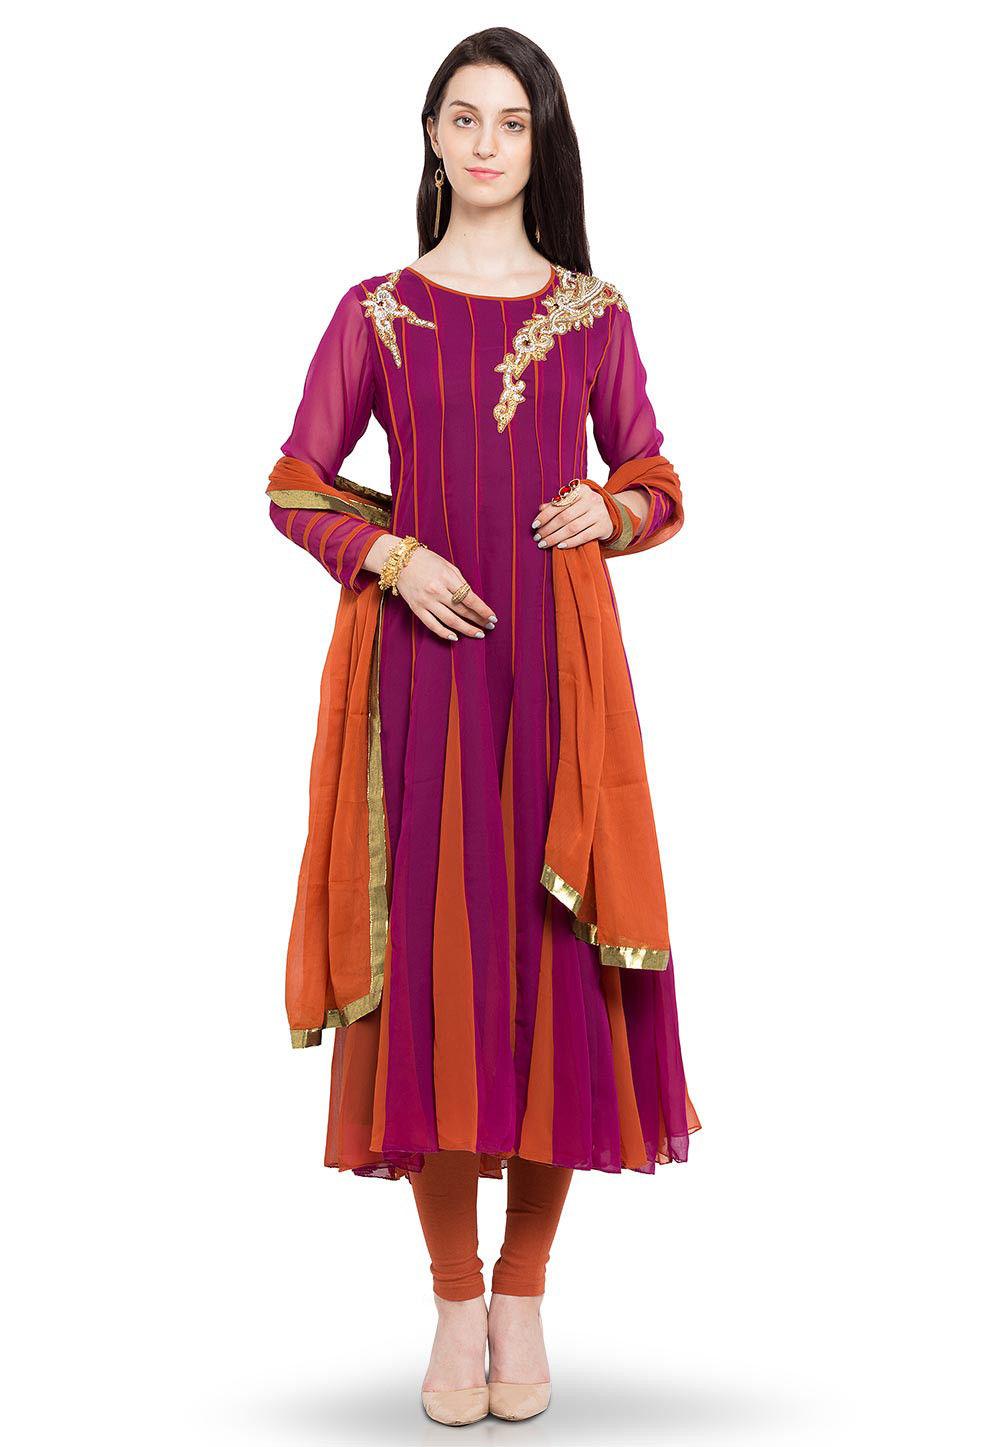 Hand Embroidered Anarkali Georgette Suit in Magenta